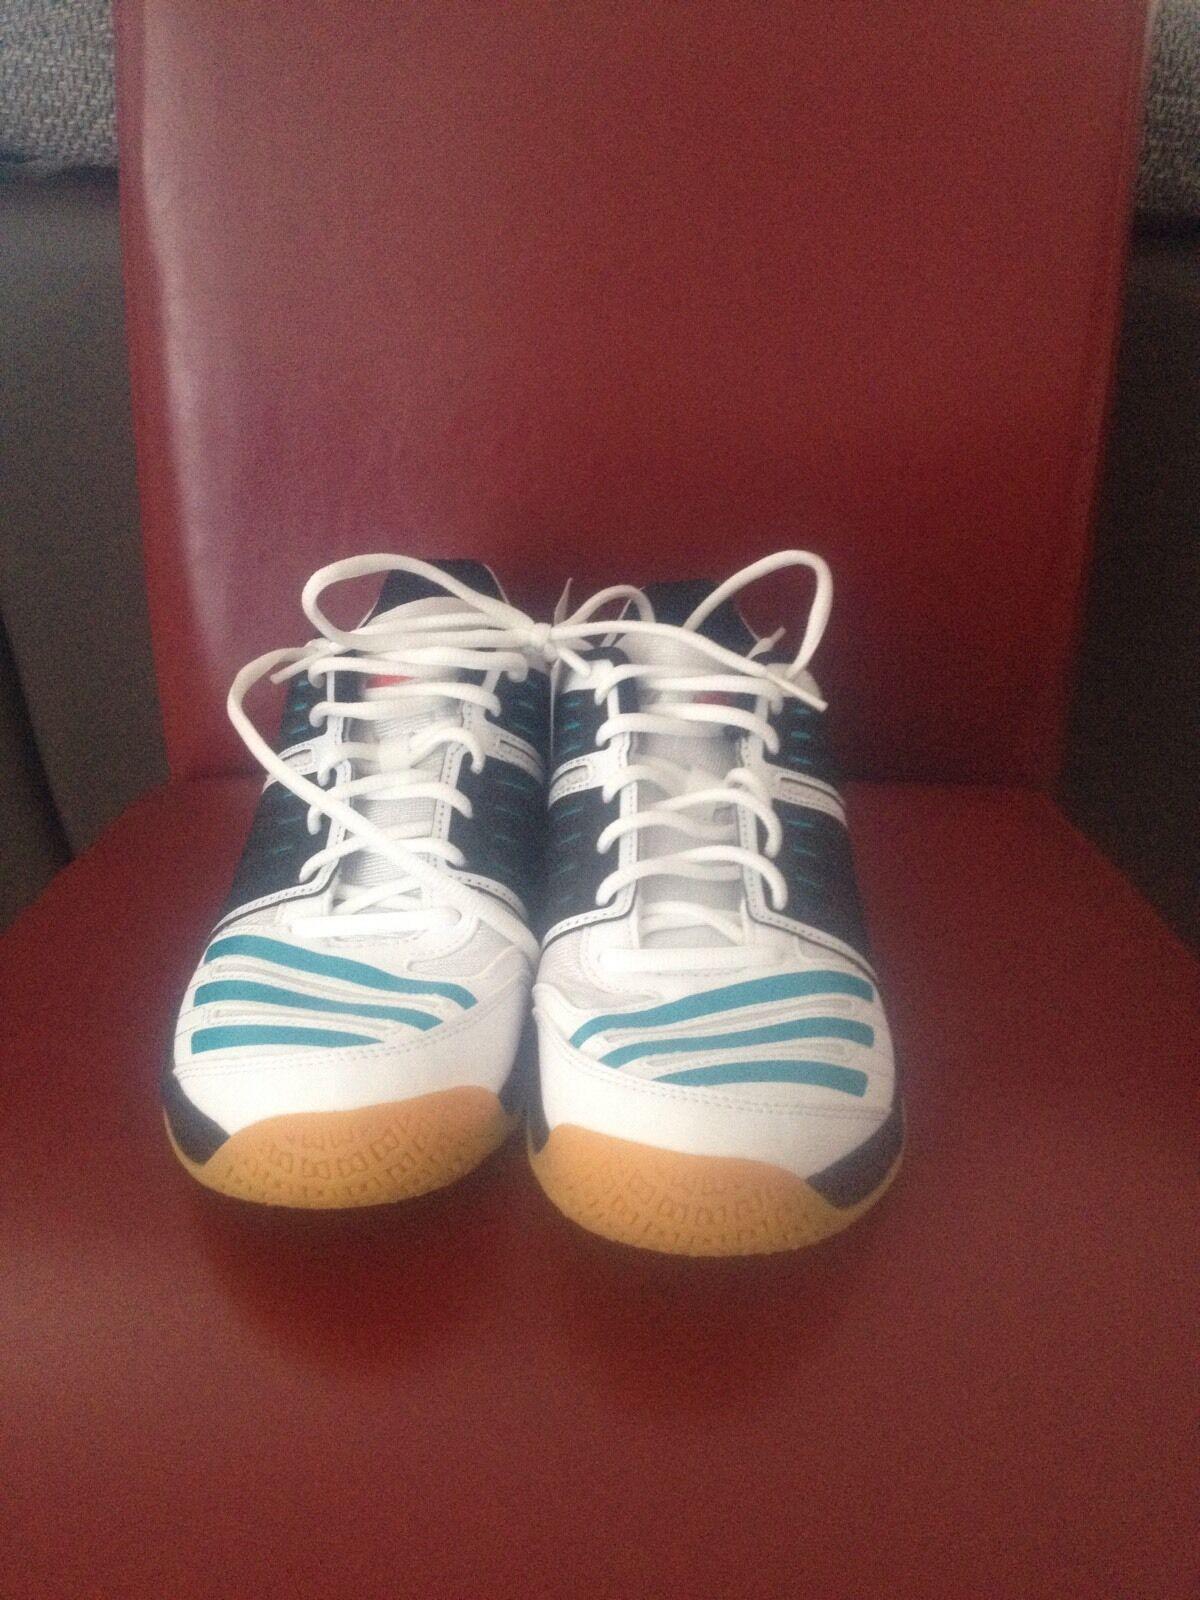 Adidas Essence 12 12 12 W Damen Handballschuhe Gr  Wählbar neu ohne Karton   | Neuer Stil  | Kunde zuerst  d66f4d